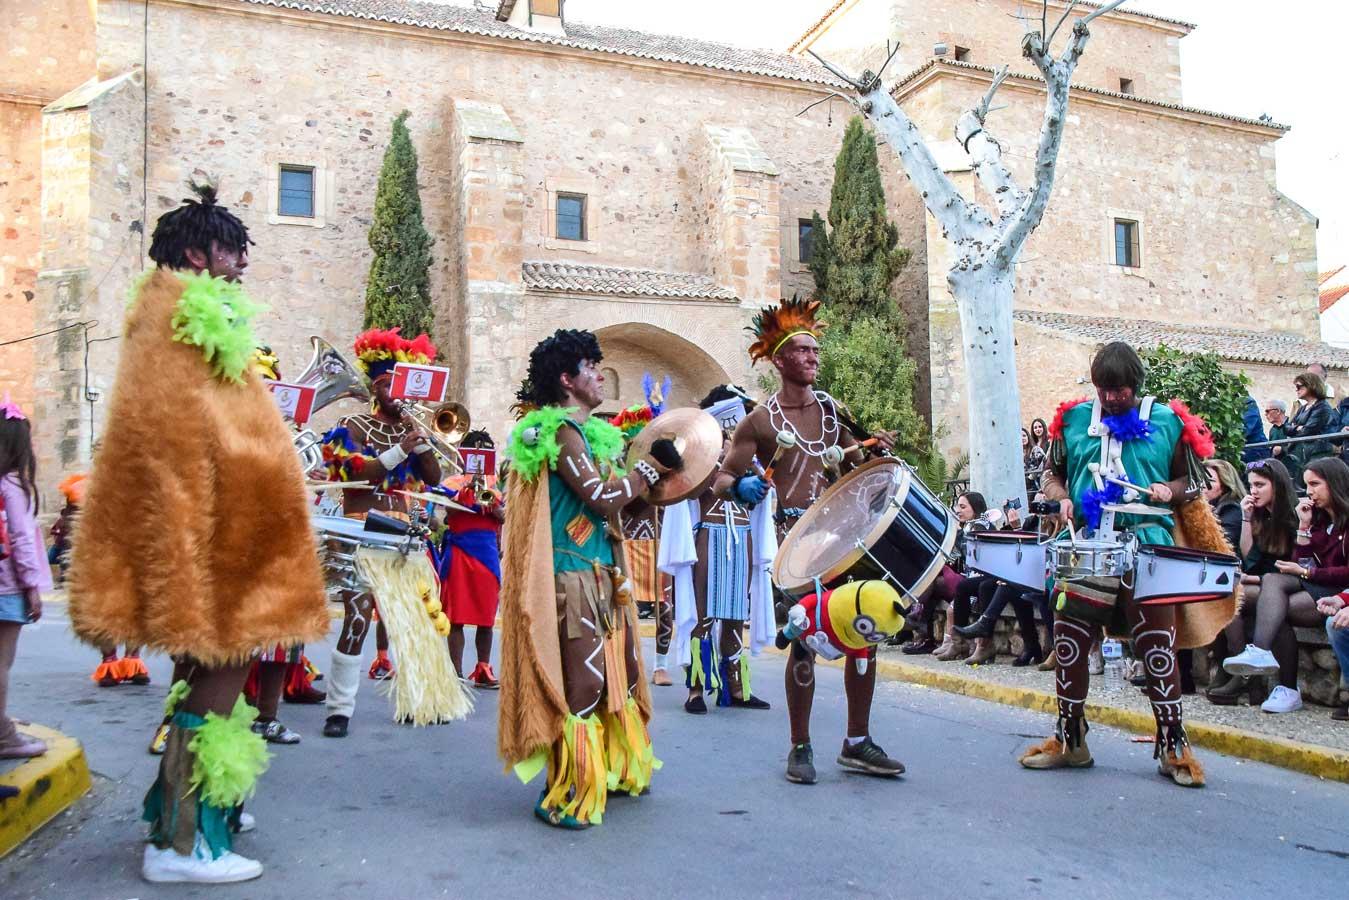 desfile_carrozas_2019 (1)